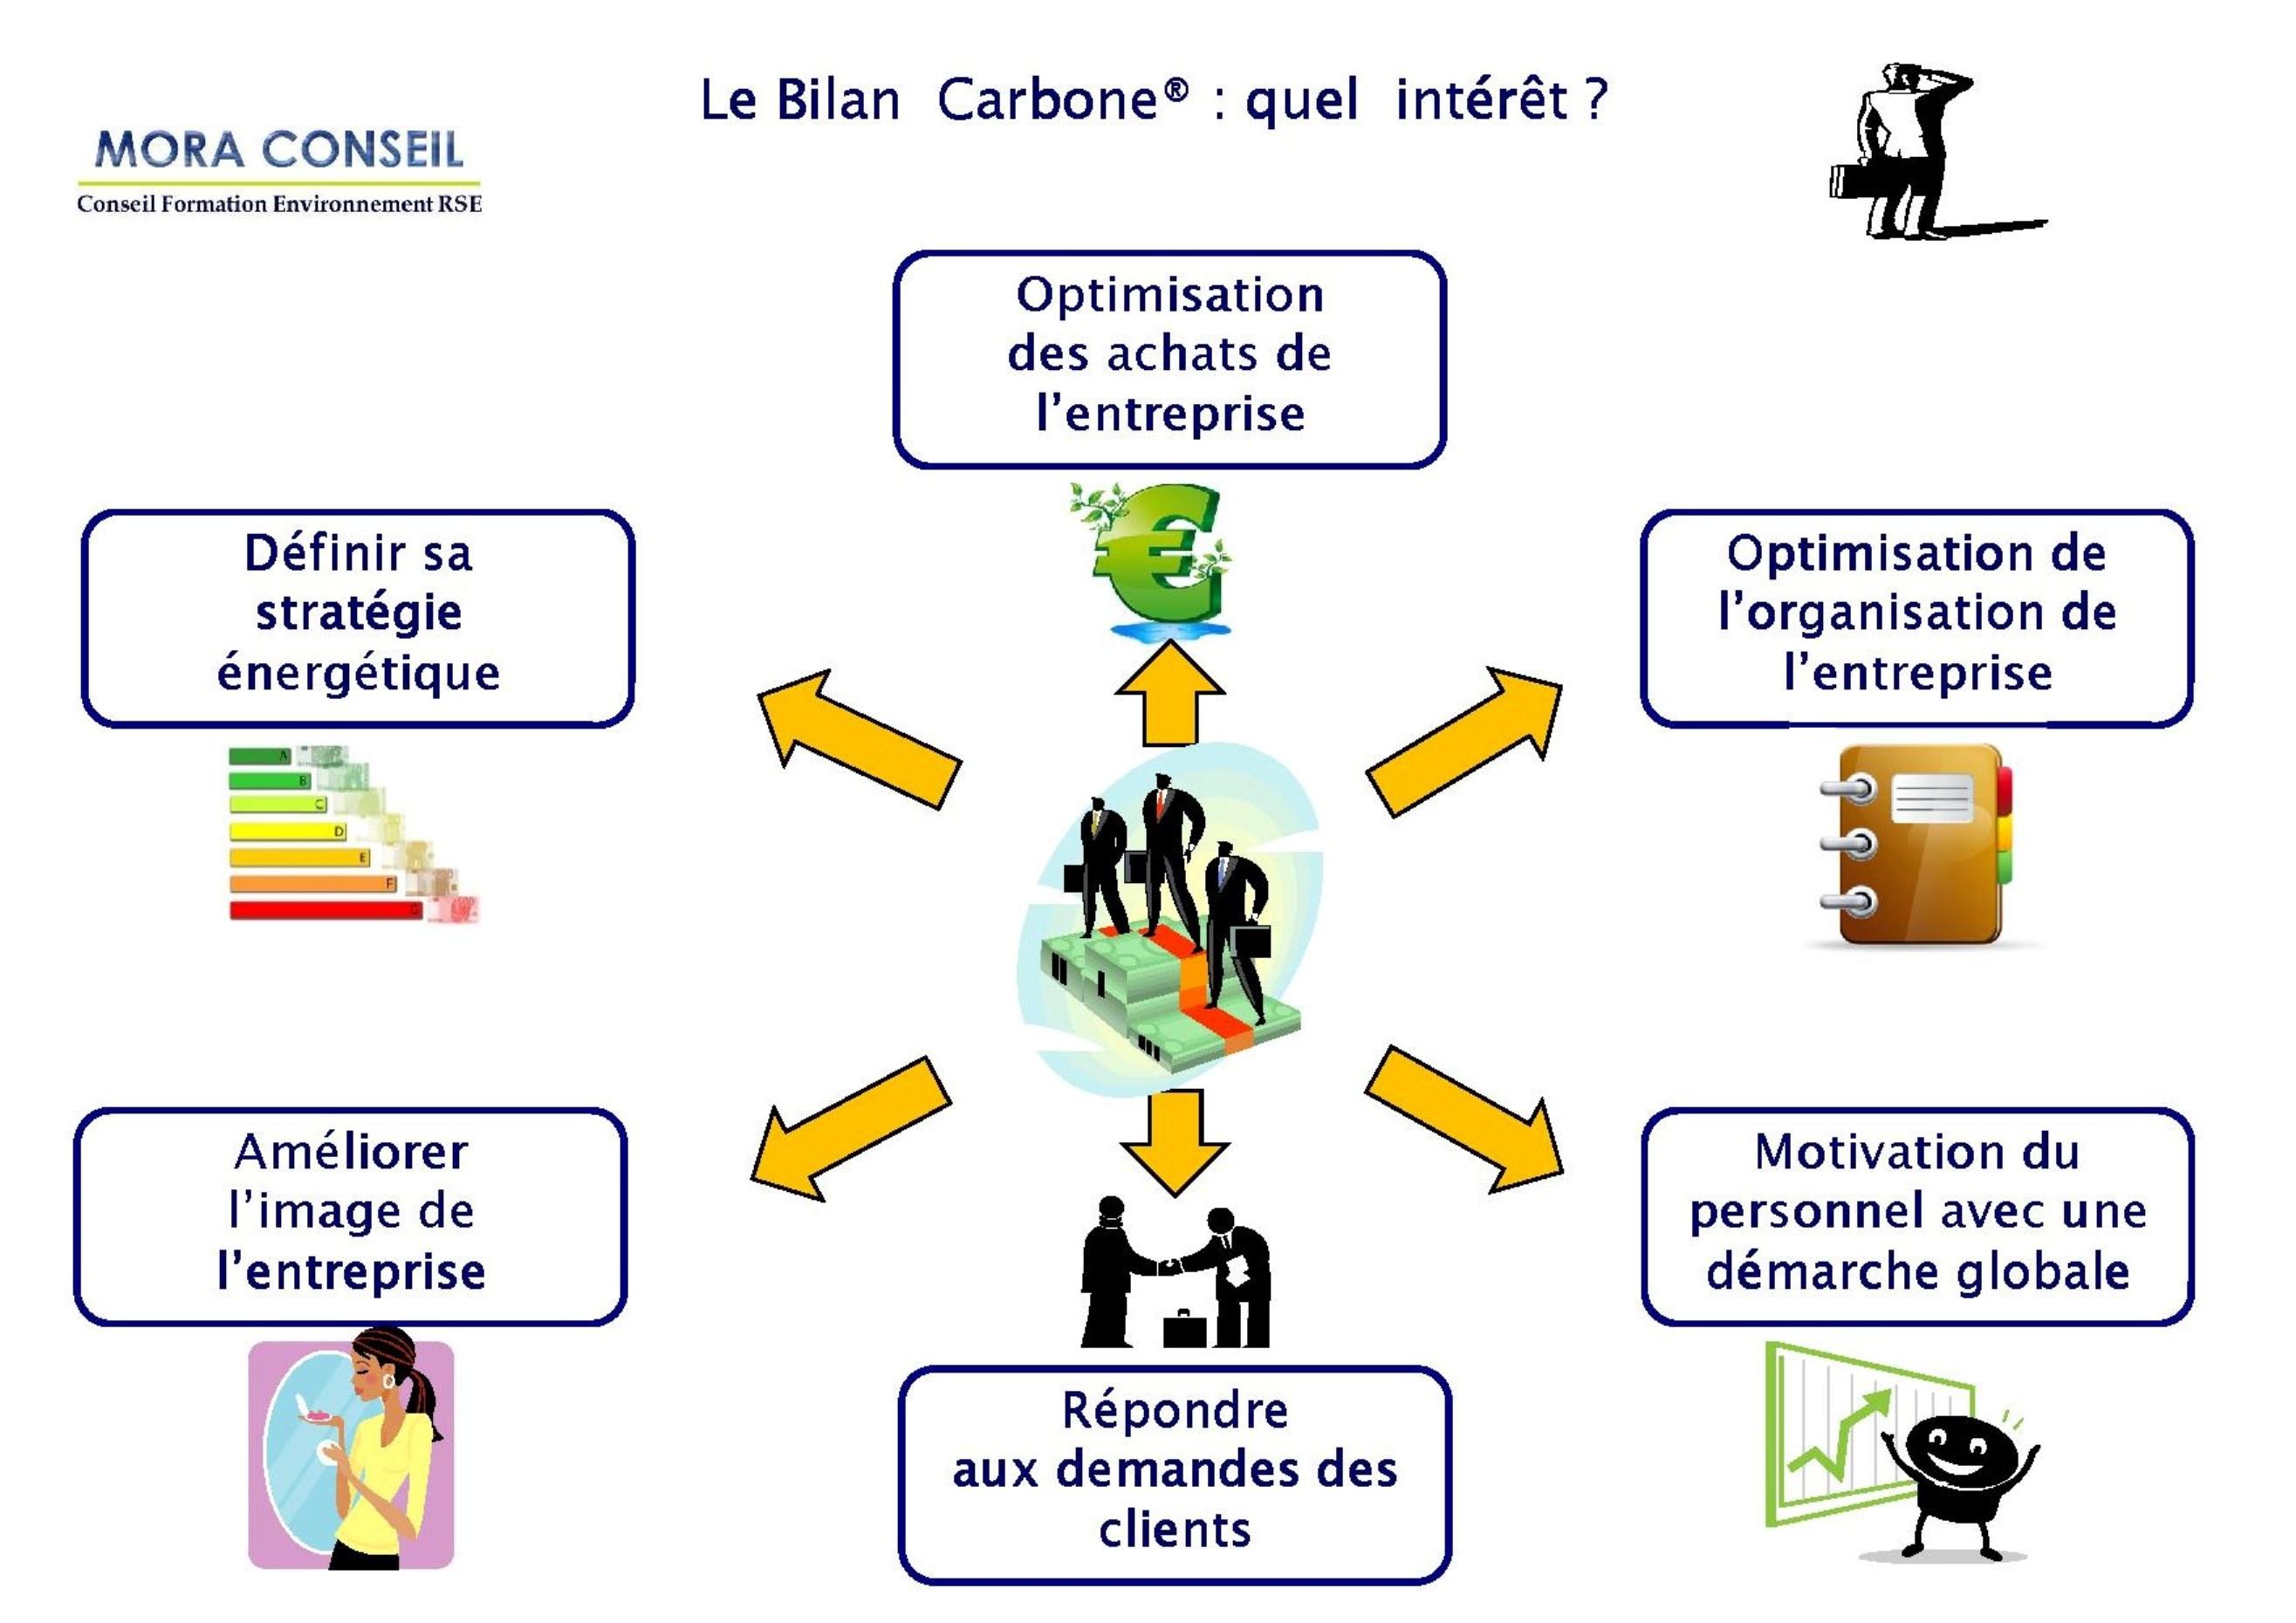 Intérêt du Bilan carbone